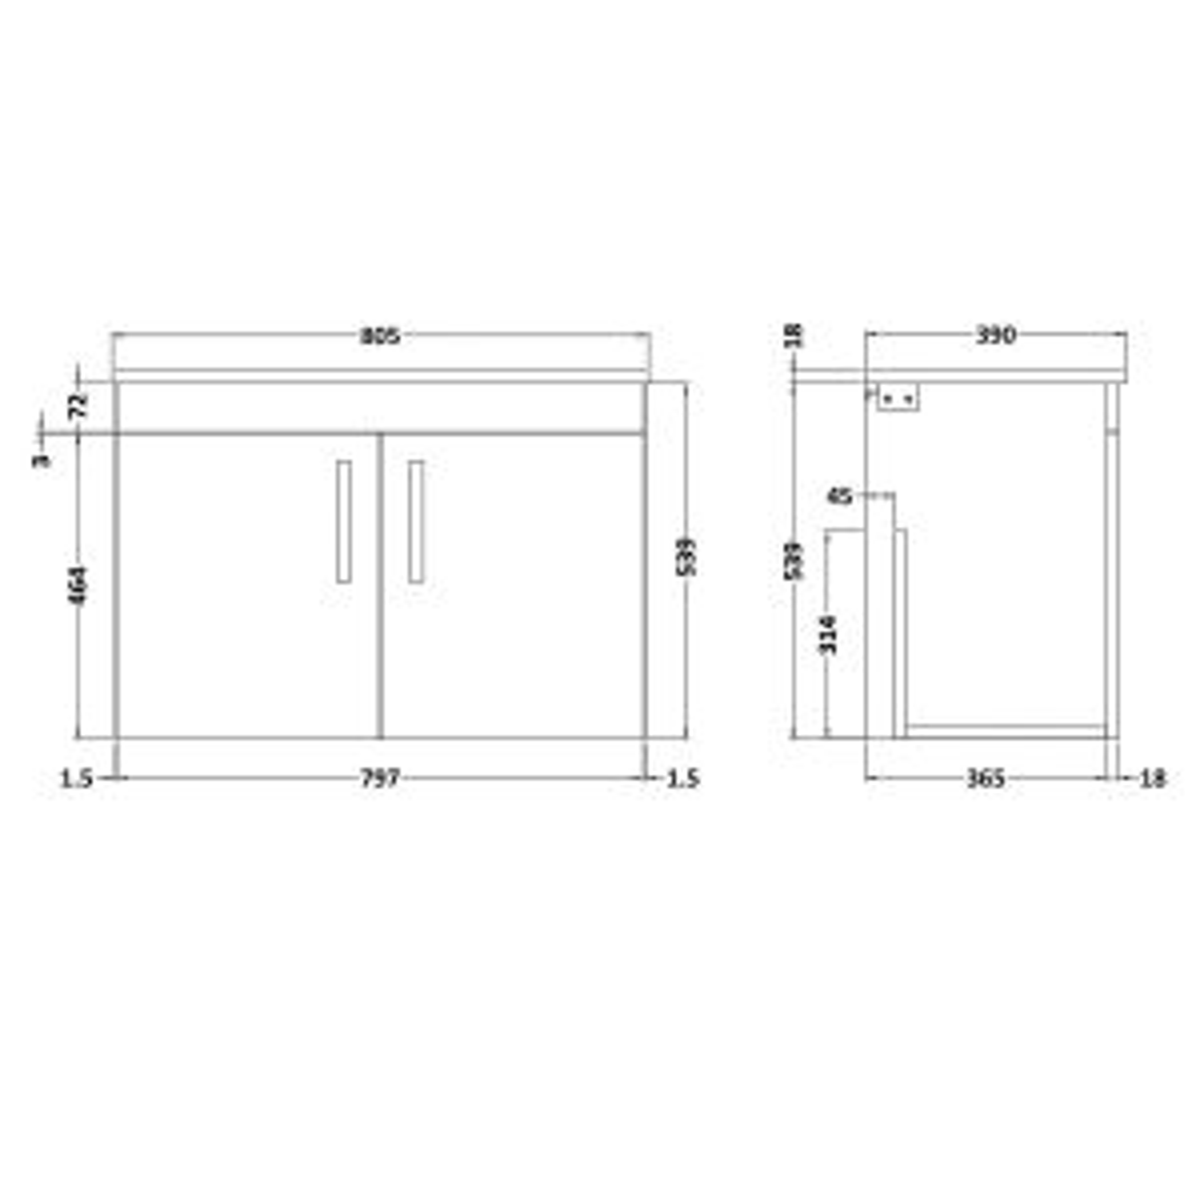 Nuie Athena Natural Oak 2 Door Wall Hung Vanity Unit with 18mm Worktop 800mm Line Drawing